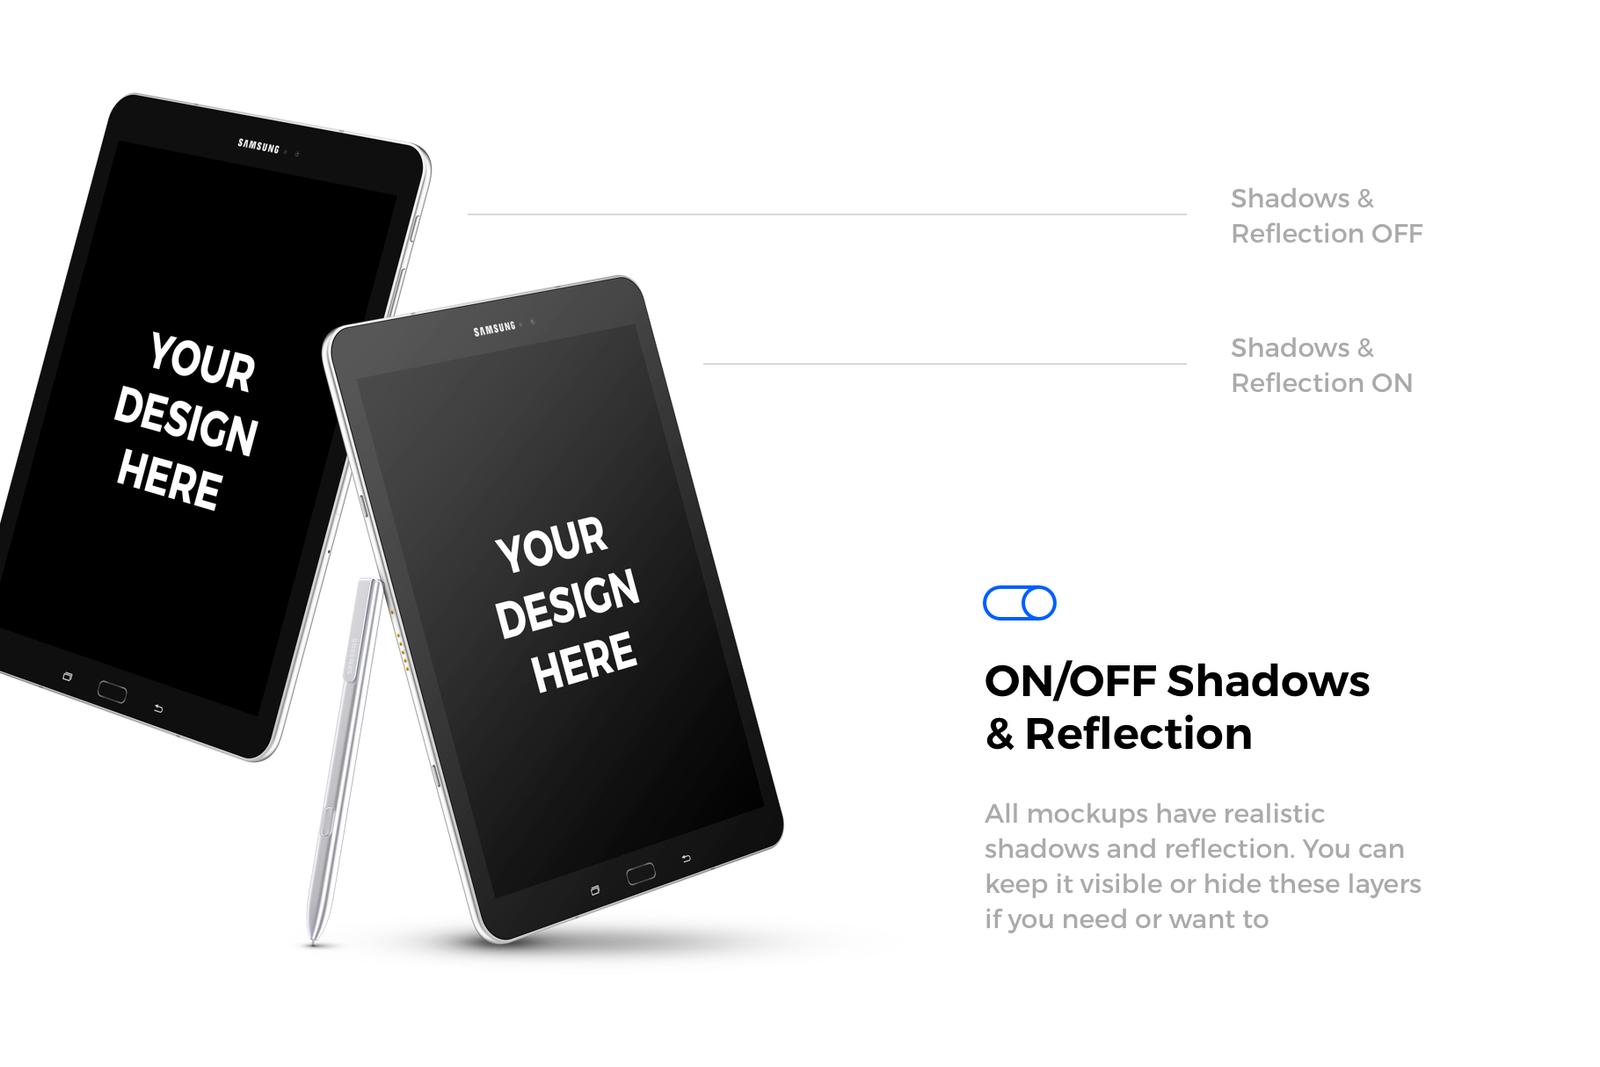 91x Android & Windows Mockups